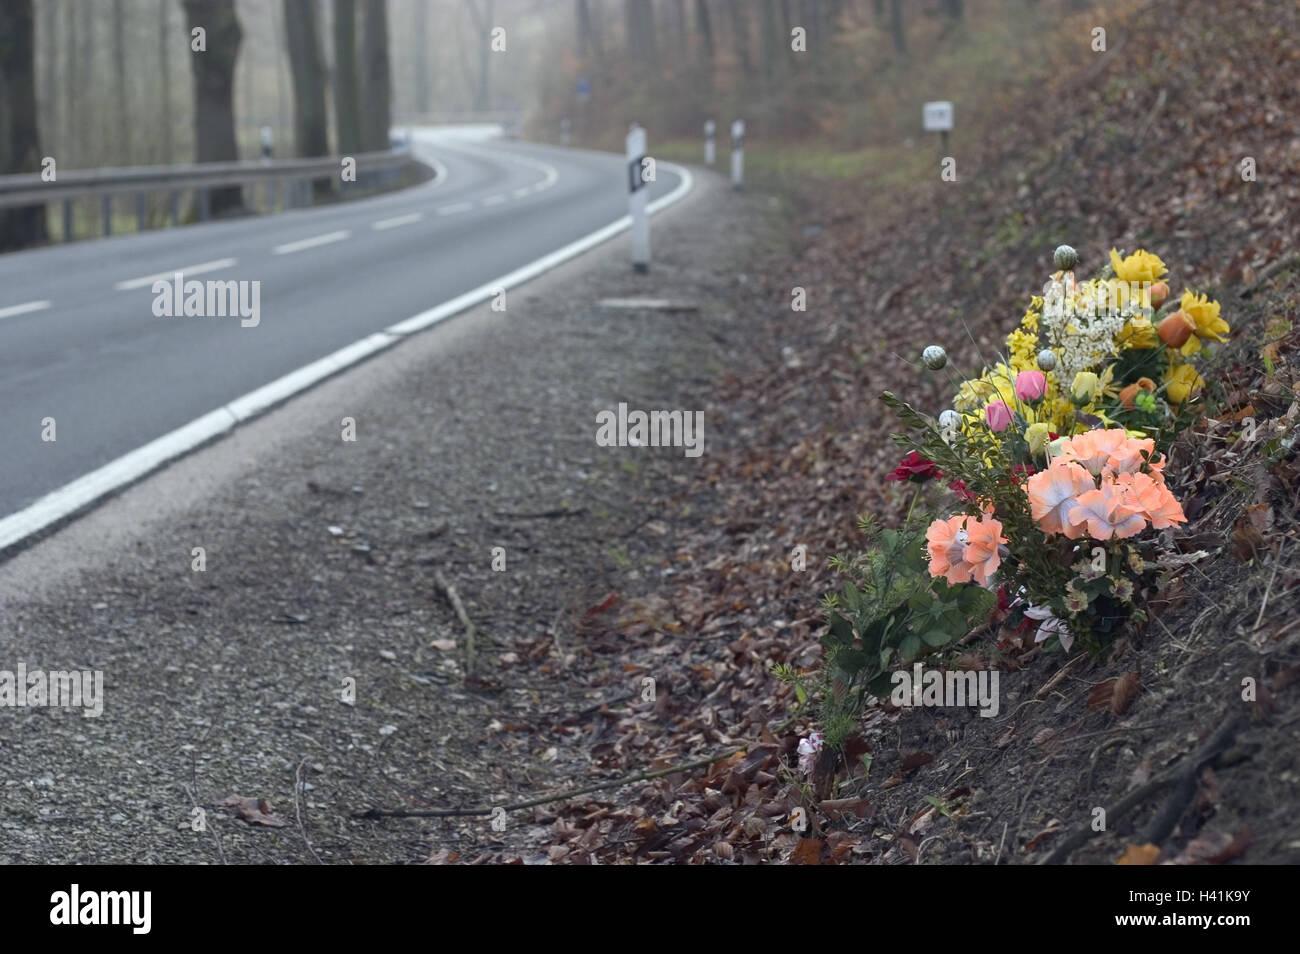 Holz, Bundesstraße, Straßenrand, Szene der Unfall, Blumen, Wald ...